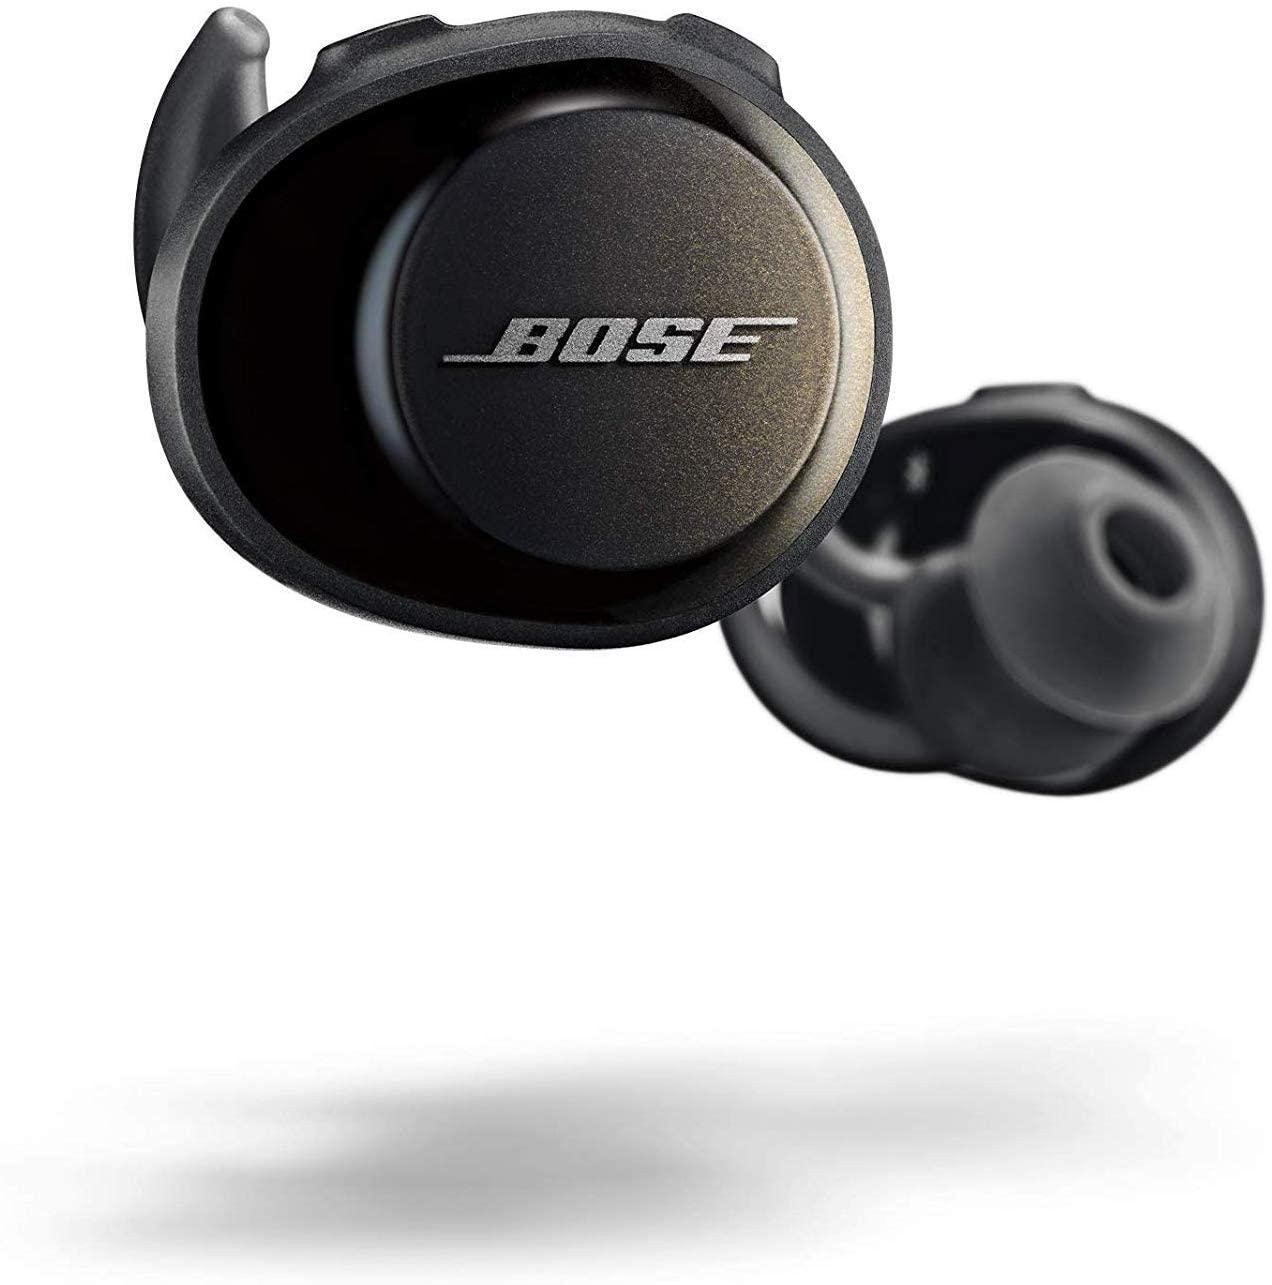 auriculares-bluetooth-para-moviles-bose-soundsport-free.jpg